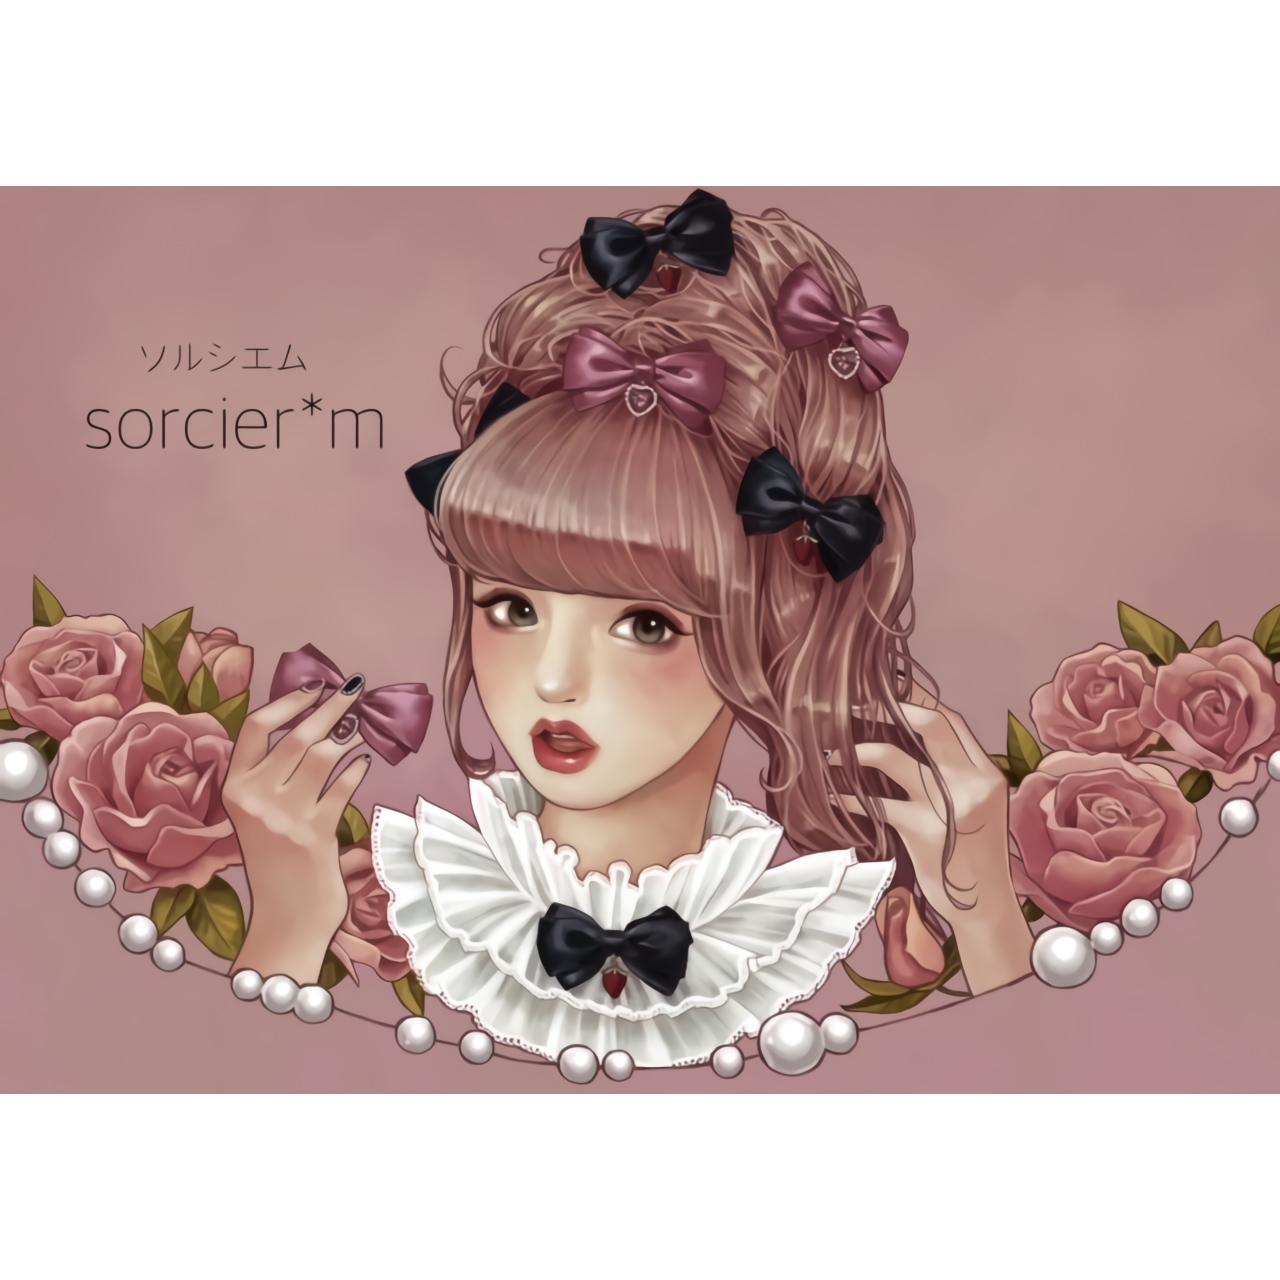 sorcier*m - ソルシエム